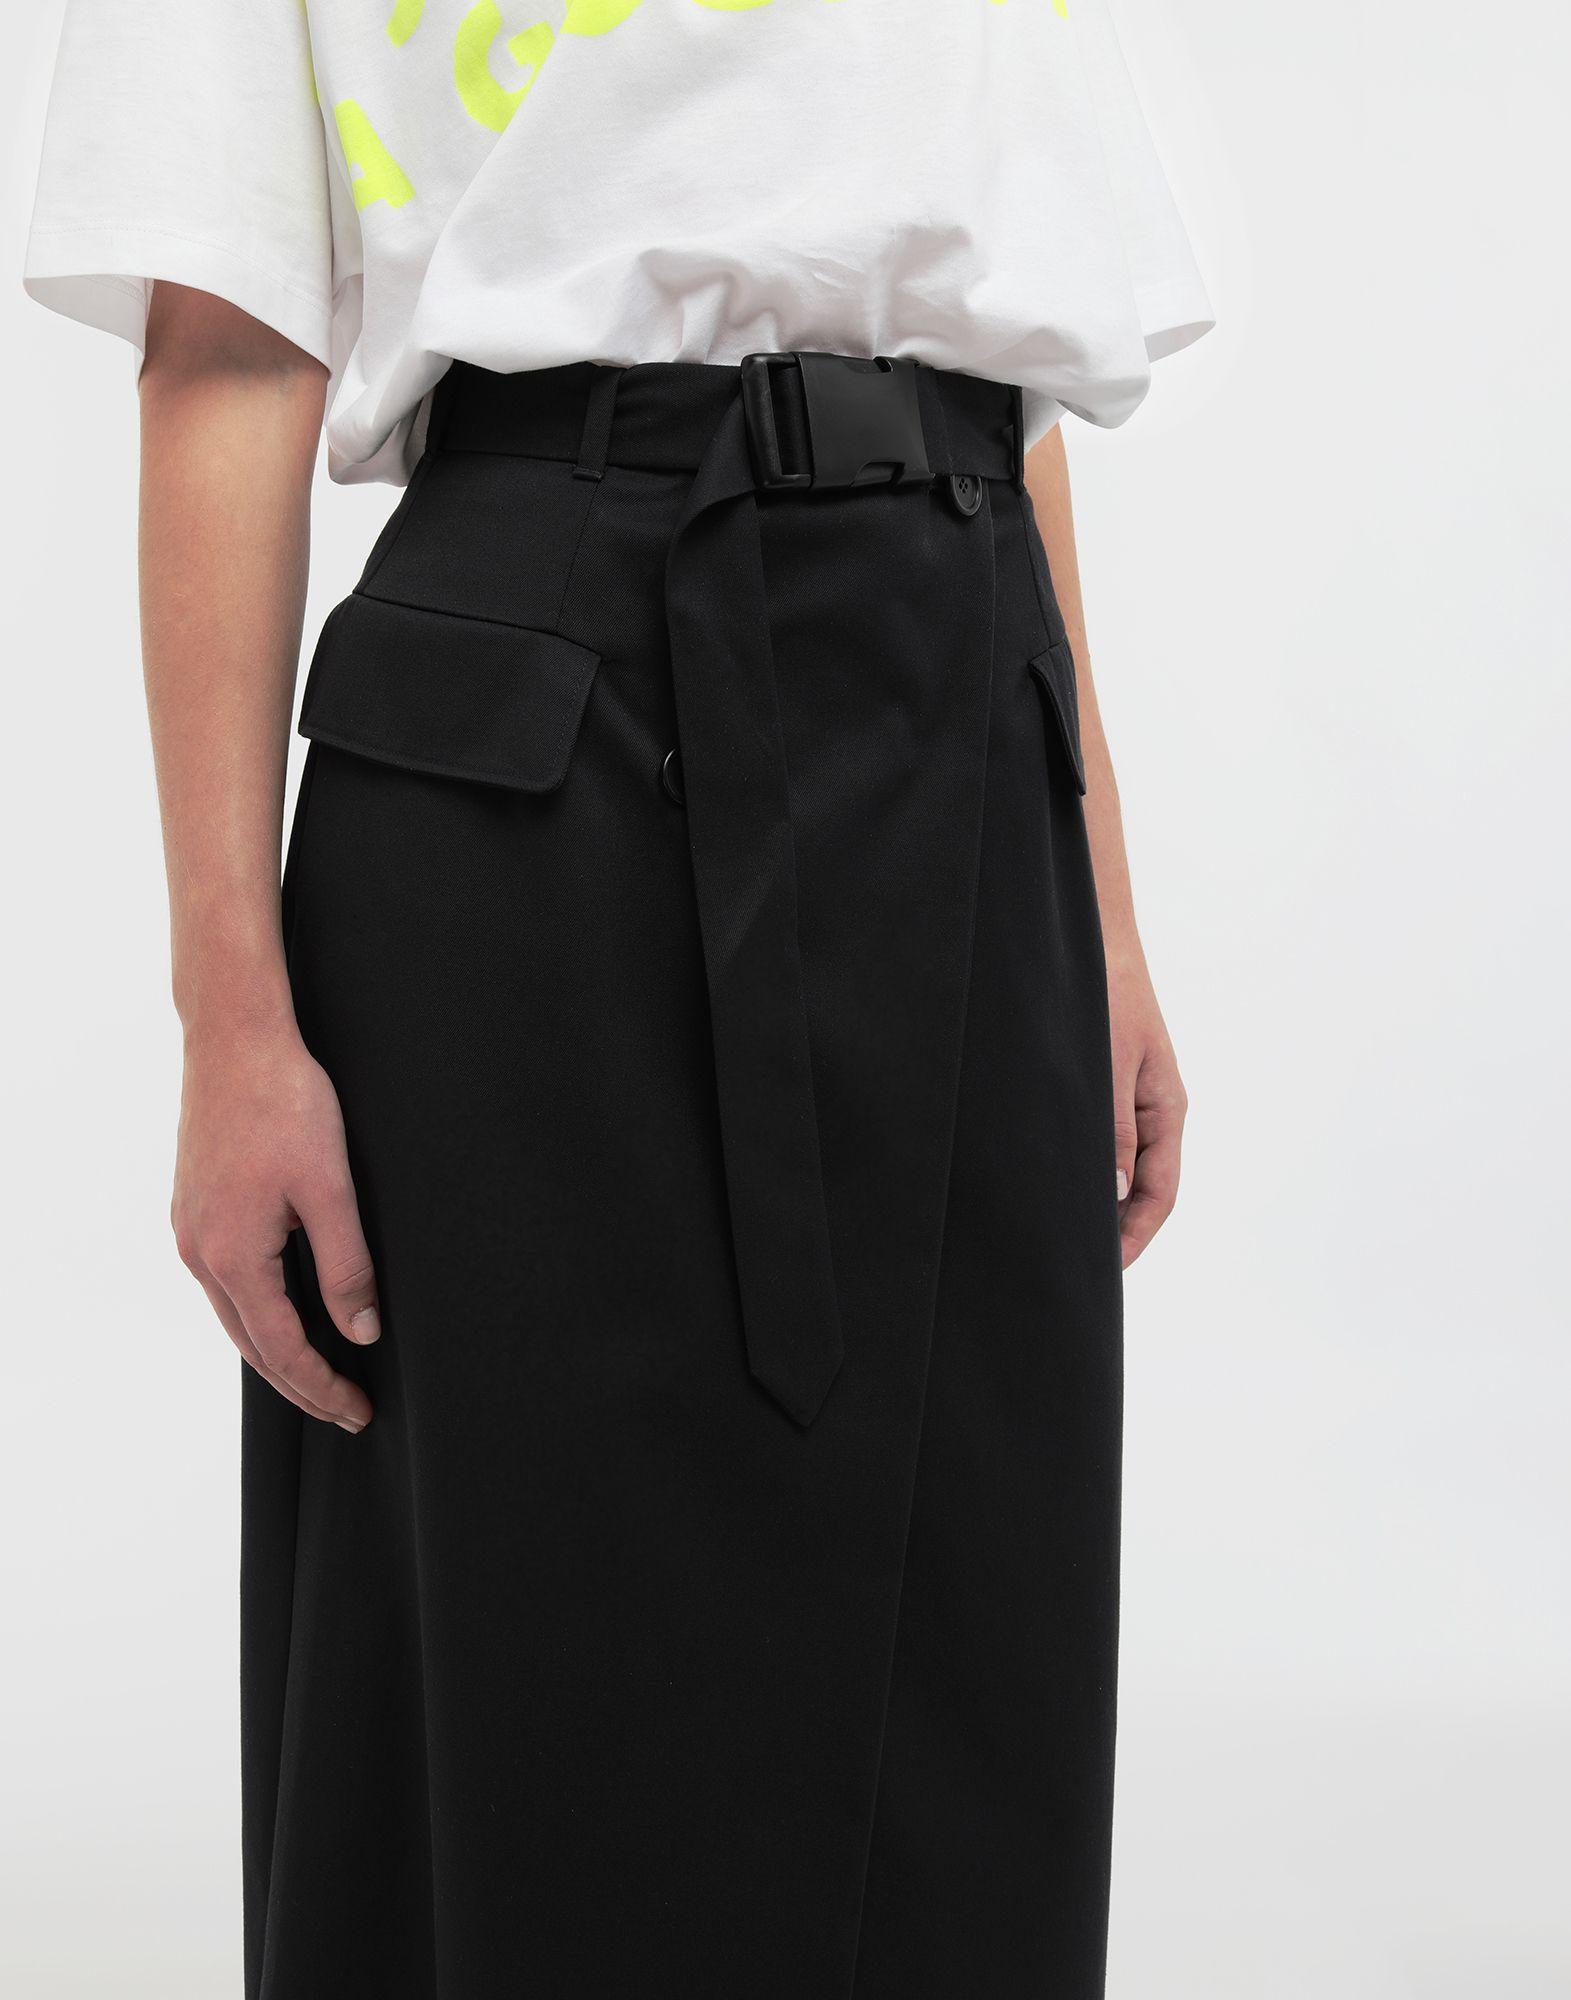 MAISON MARGIELA Double layer cotton-blend midi skirt 3/4 length skirt Woman b